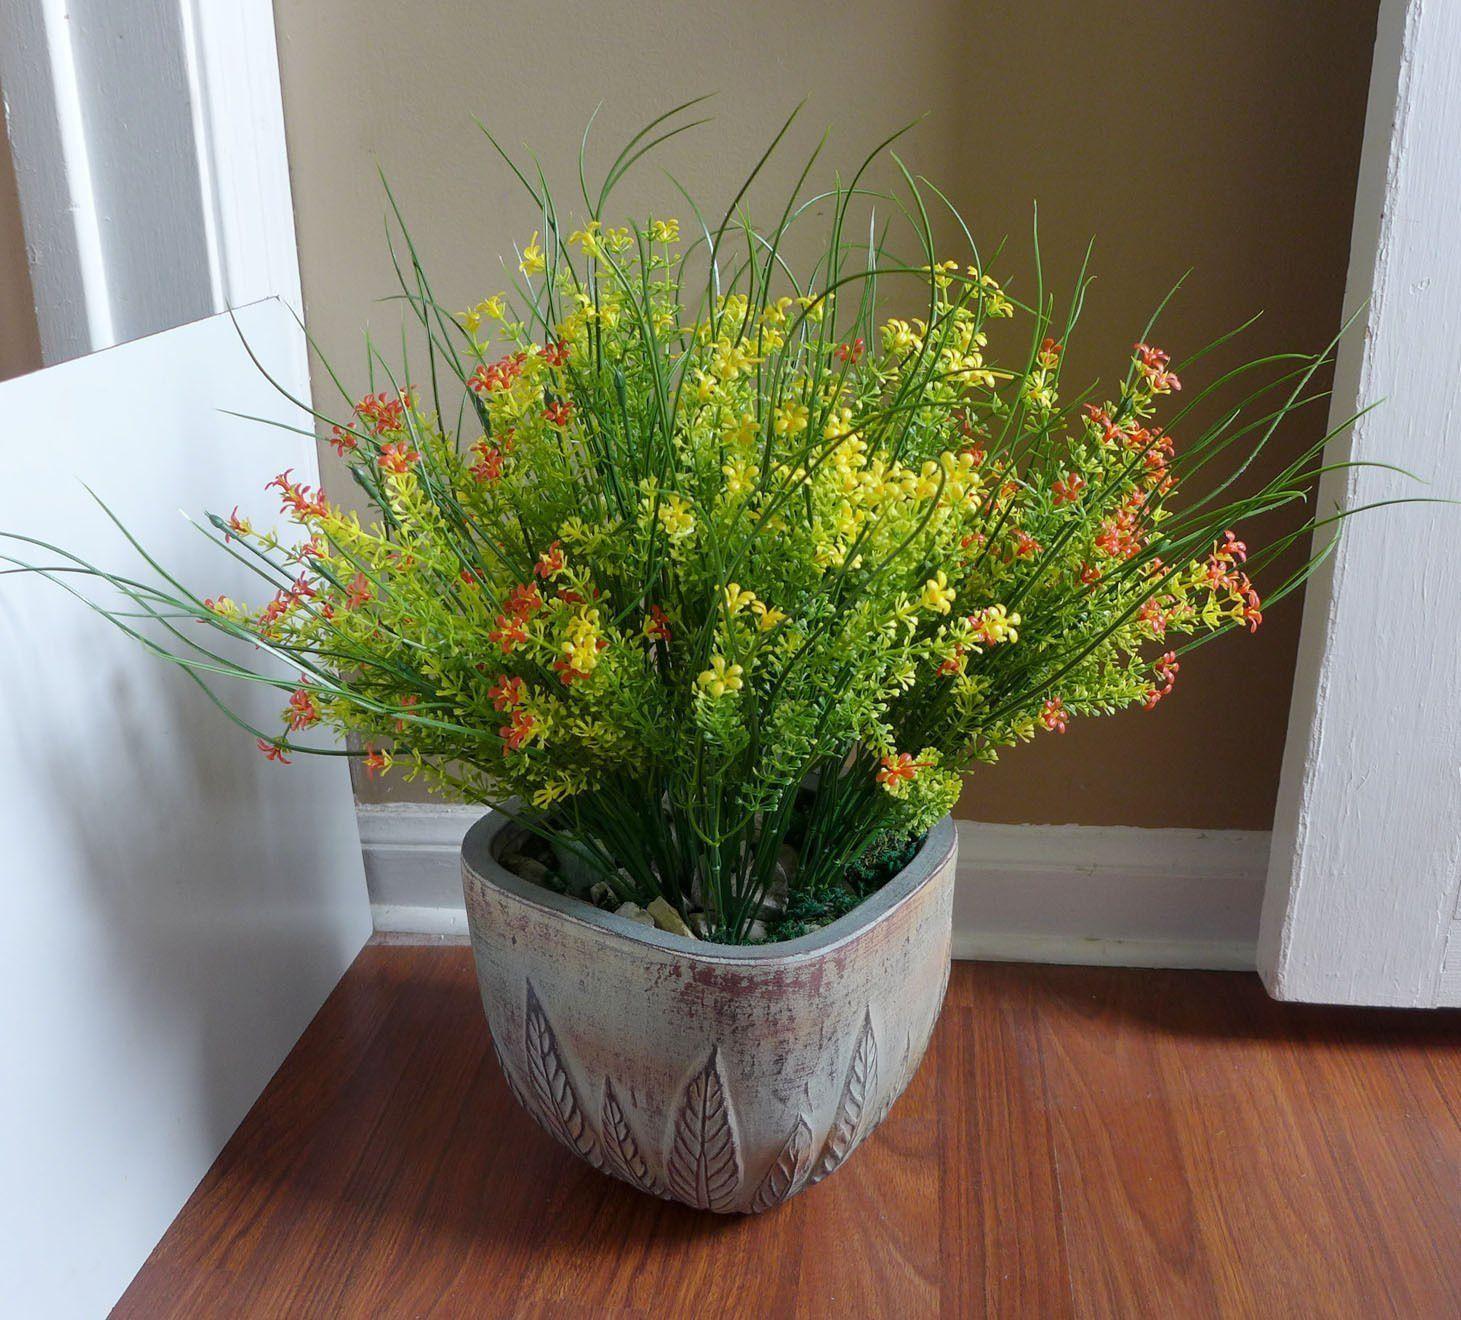 Artificial plants for kitchen - Artificial Plants Bunches Flower Yellow Red Grass Bushes Plastic Landscape Miniature Succulents For Decoration Office Kitchen